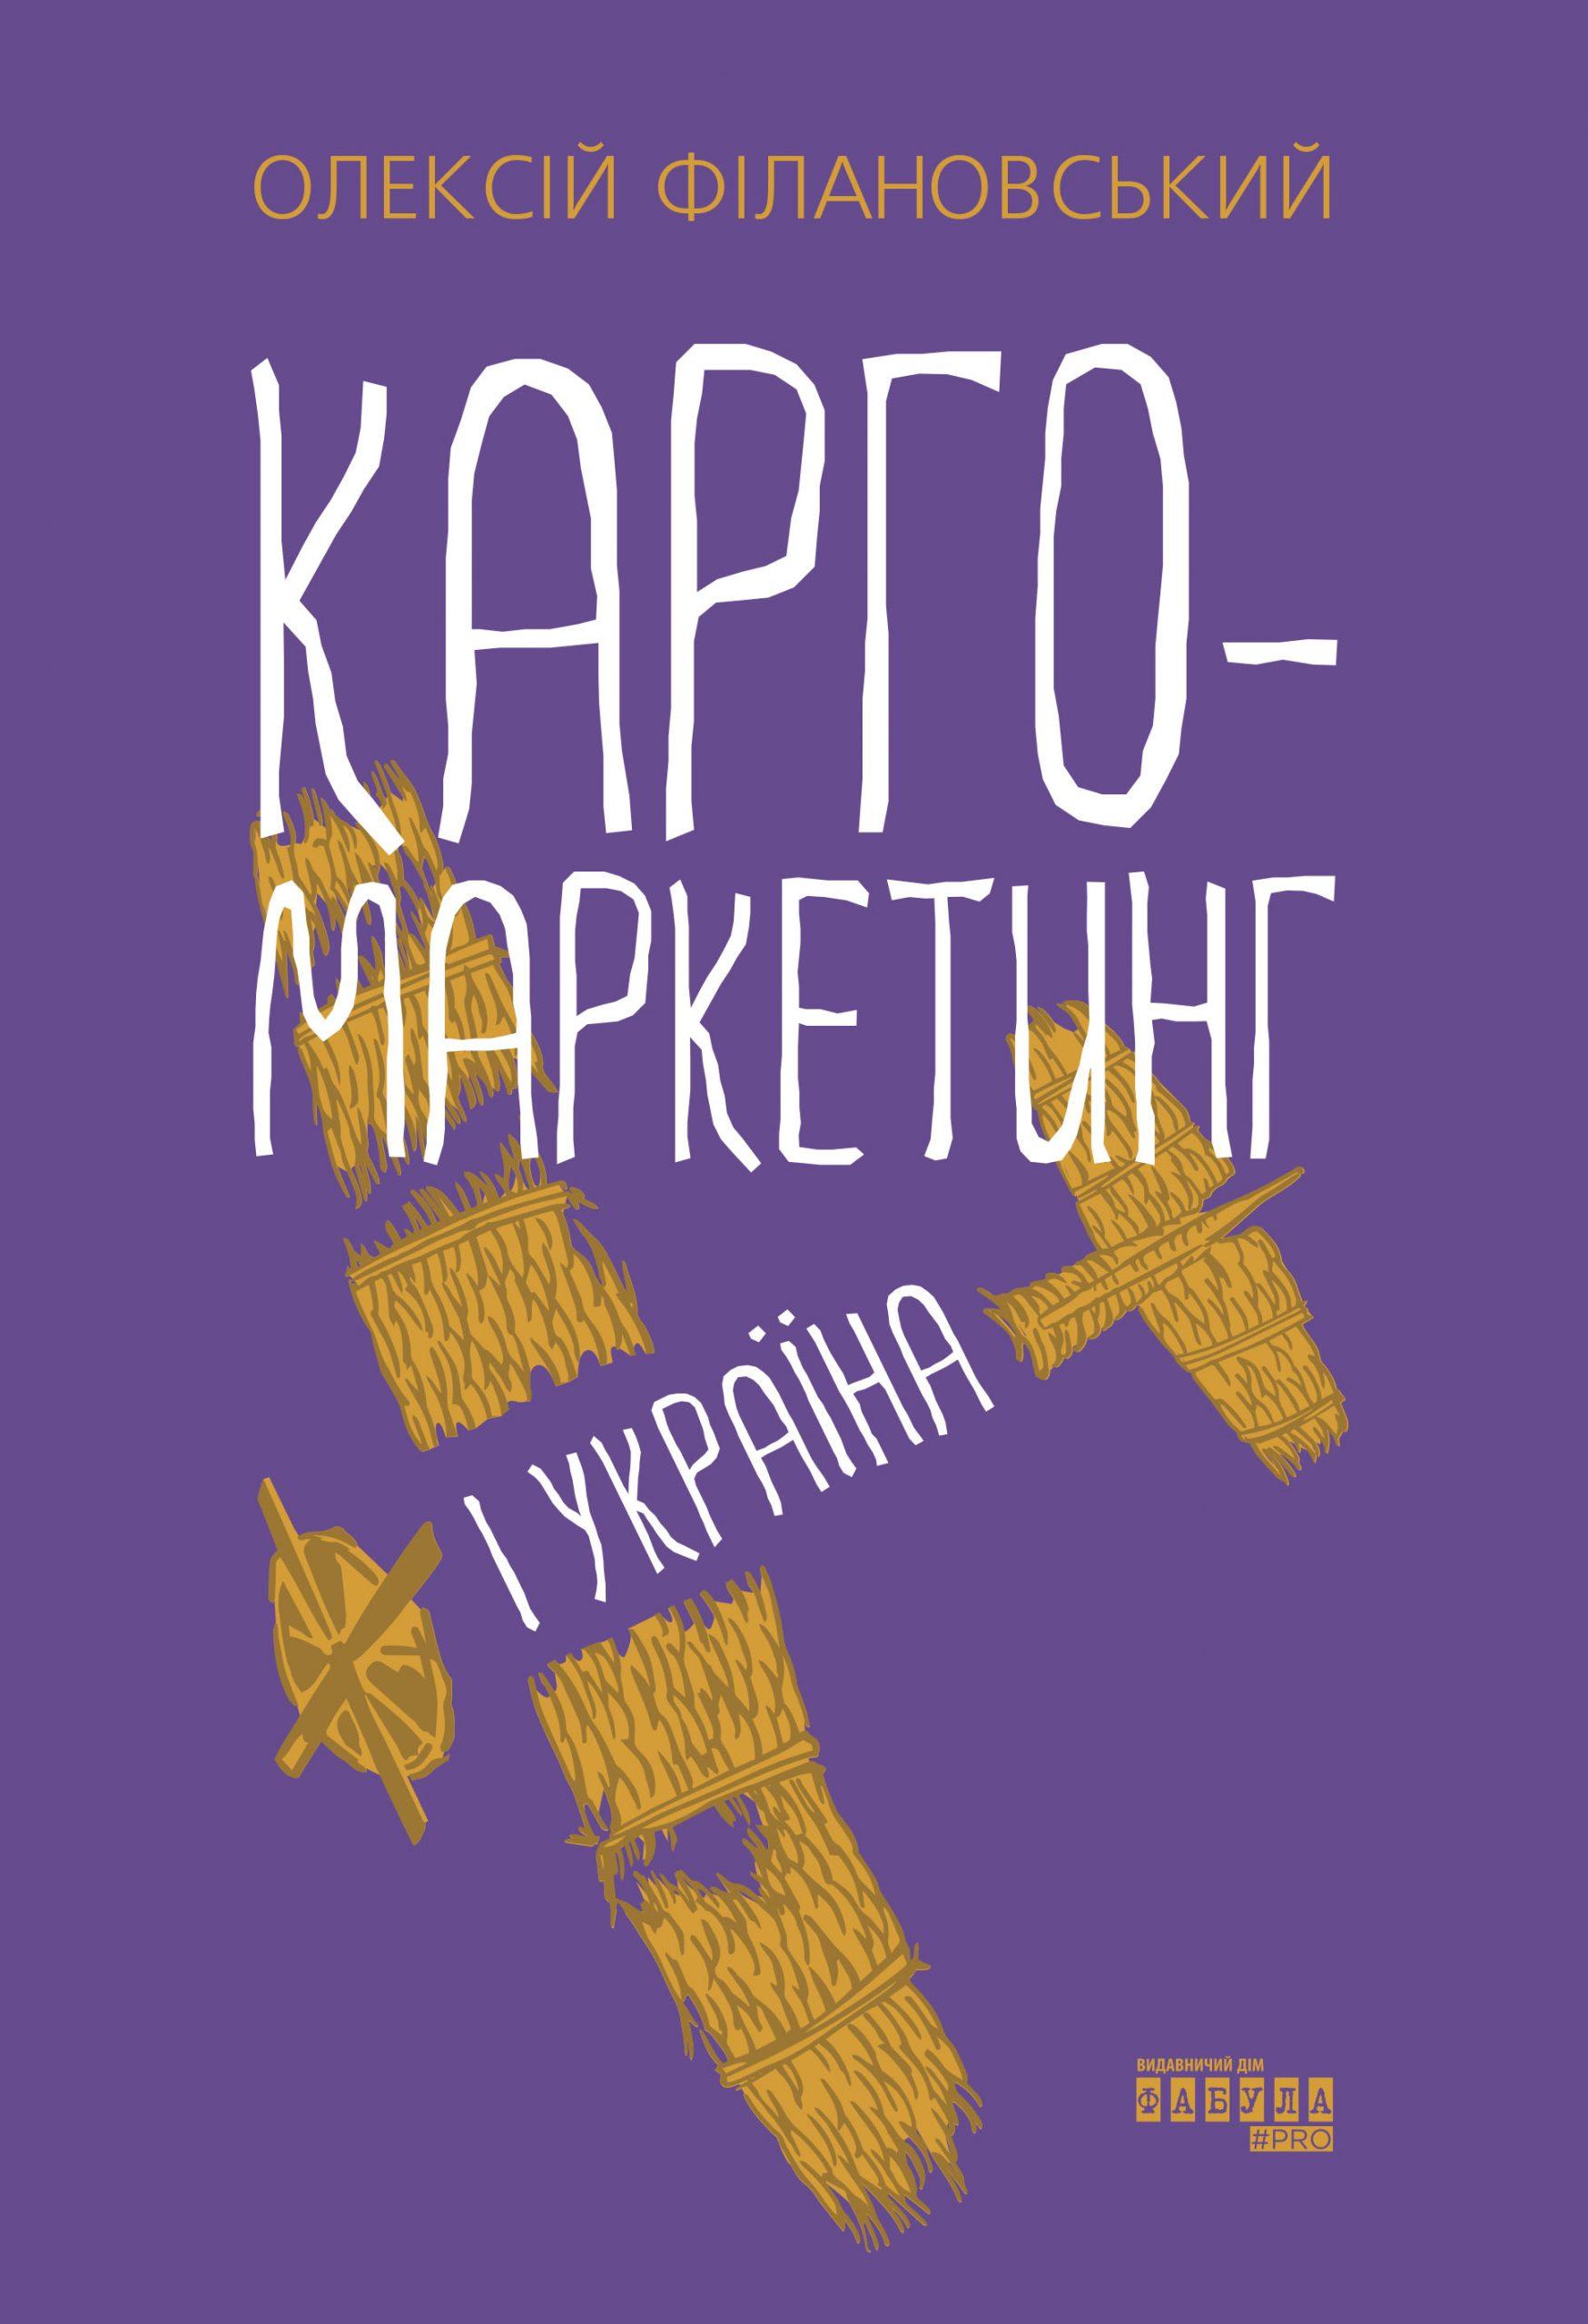 Карго-маркетинг і Україна